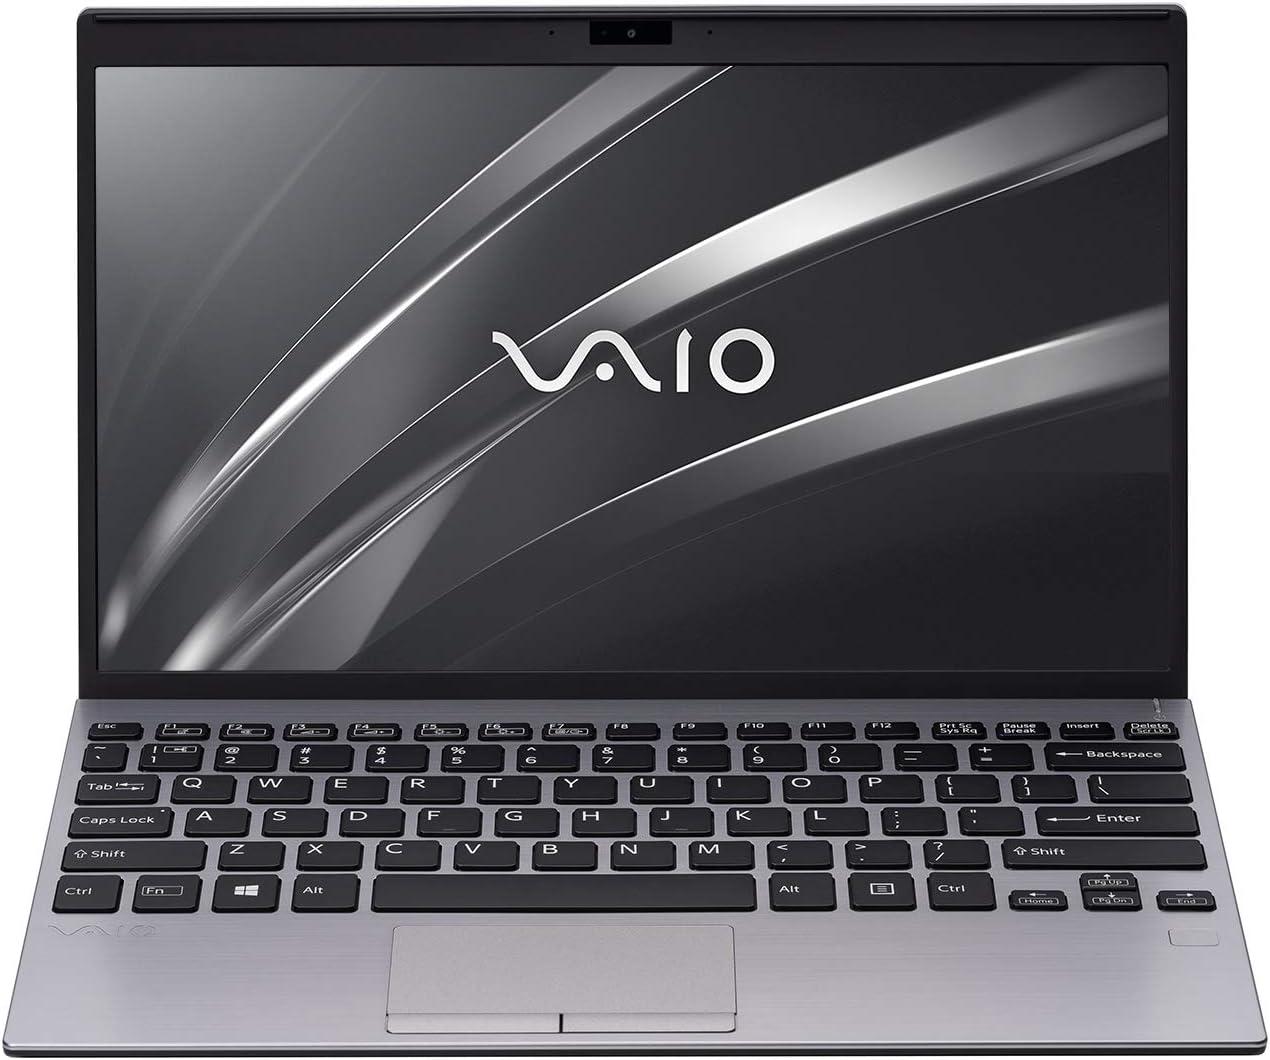 "VAIO SX12 - Intel Core i5-10210U | 8GB Memory (RAM) | 512GB PCIe SSD | Windows 10 Pro | 12.5"" Full HD (1920x1080) Display | Silver"